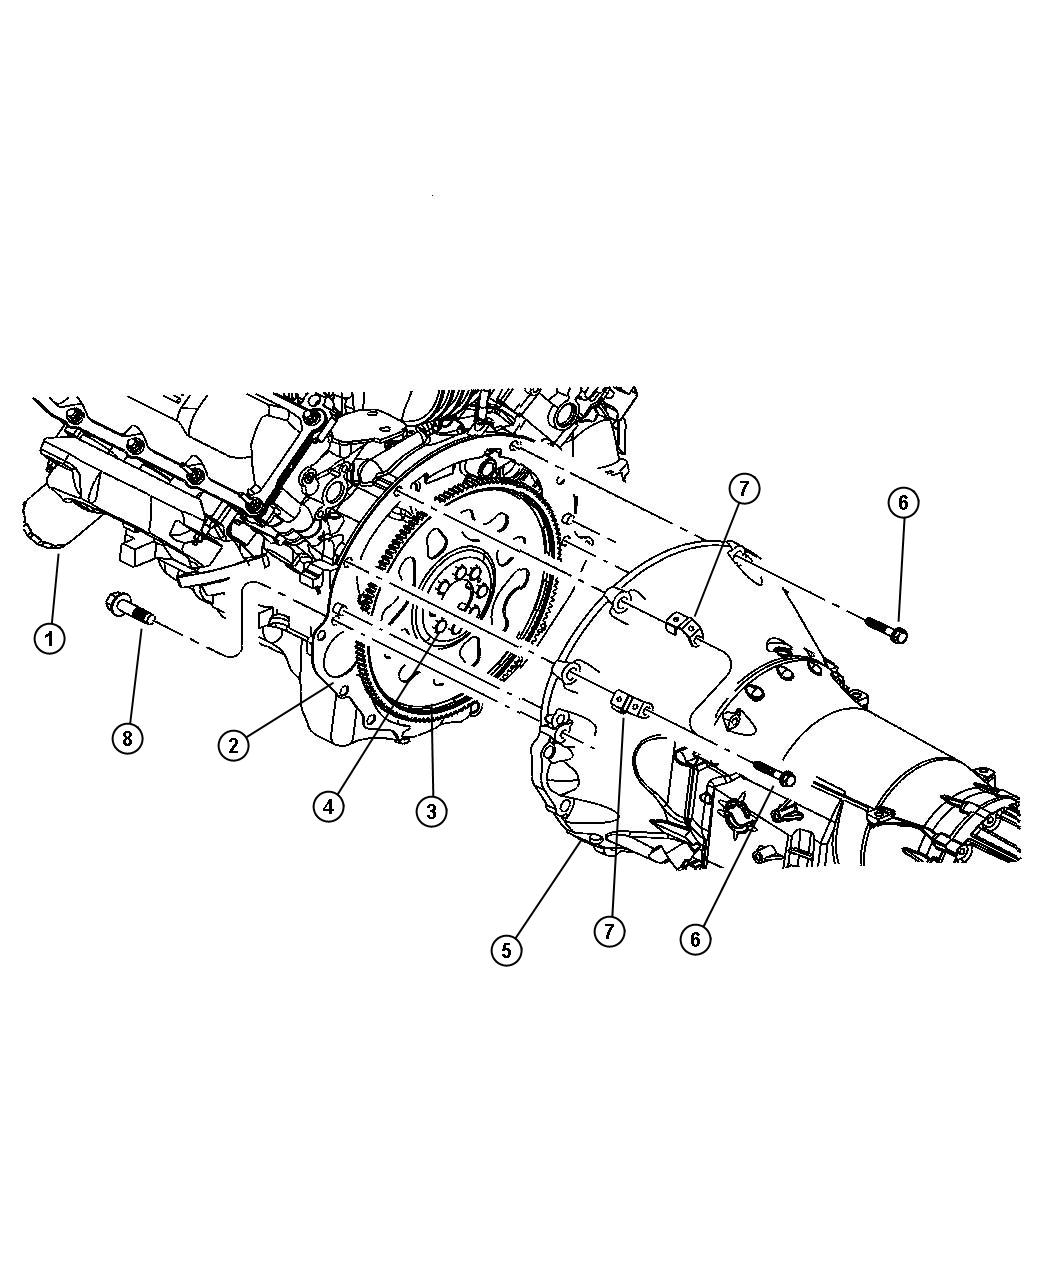 2005 jeep grand cherokee wiring harness wiring diagram database tags 1996 jeep grand cherokee wiring diagram 2000 jeep cherokee wiring harness 2011 jeep grand cherokee wiring diagram 1998 jeep grand cherokee wiring